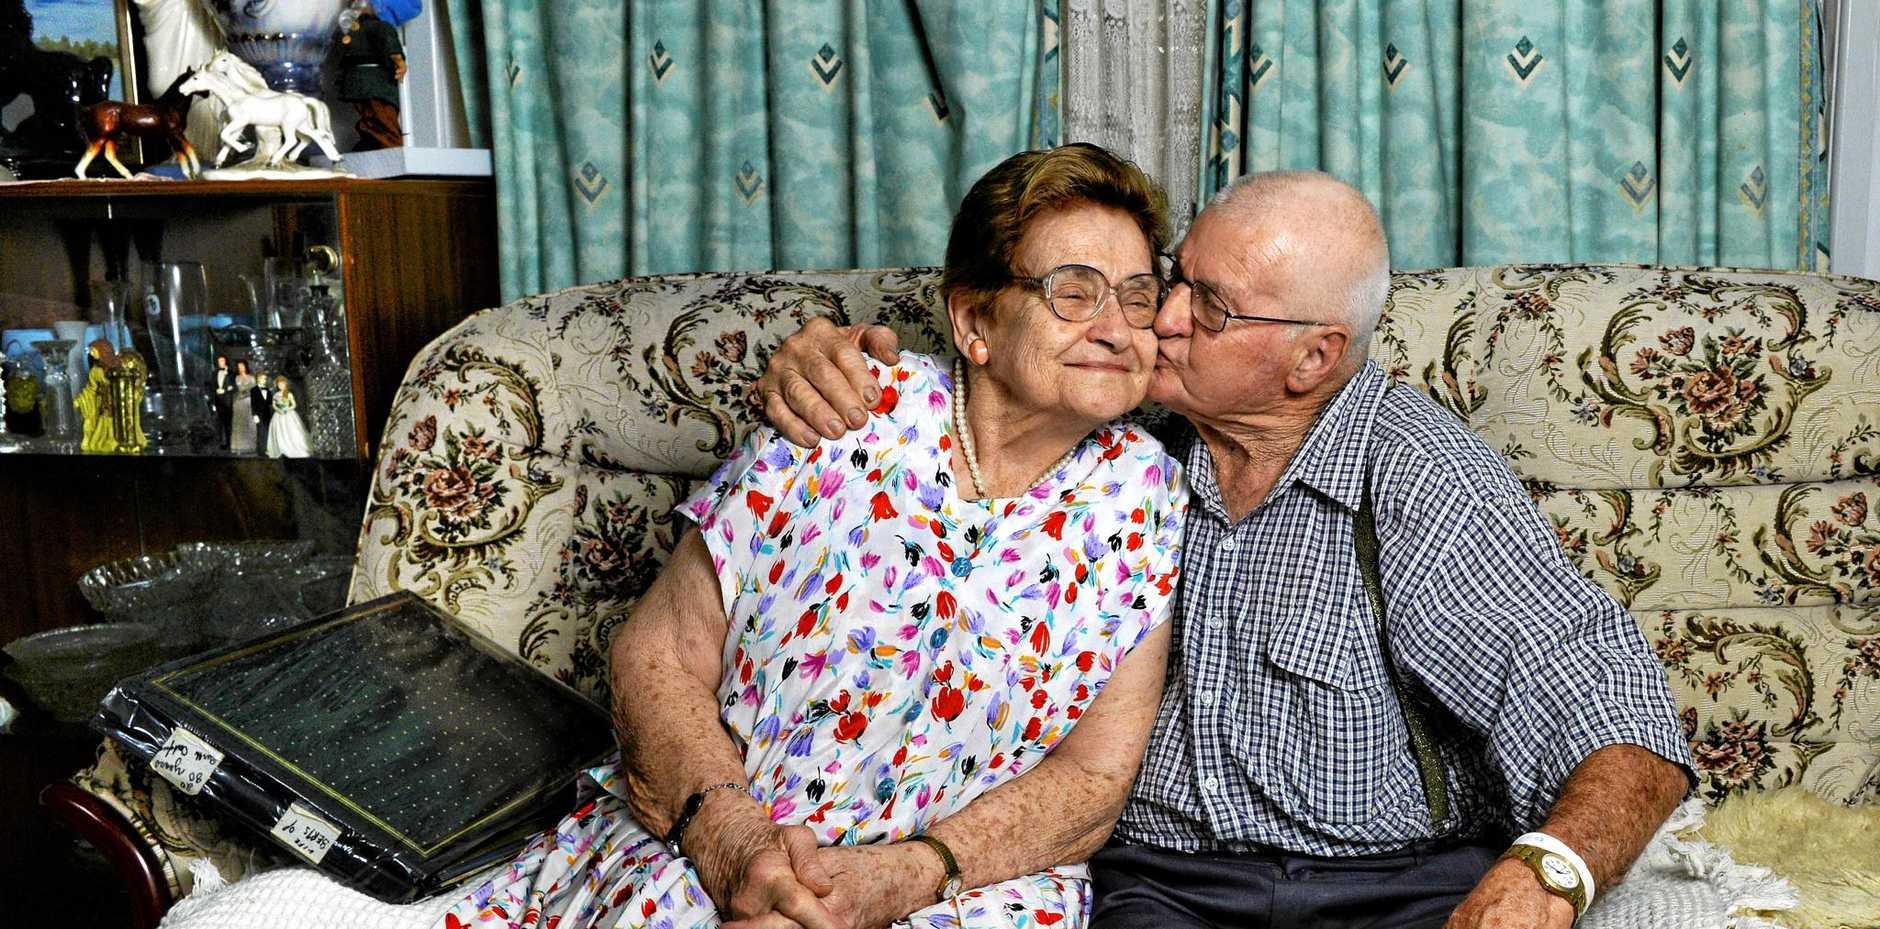 Betty and Albert Ross celebrate their 65th wedding anniversary.